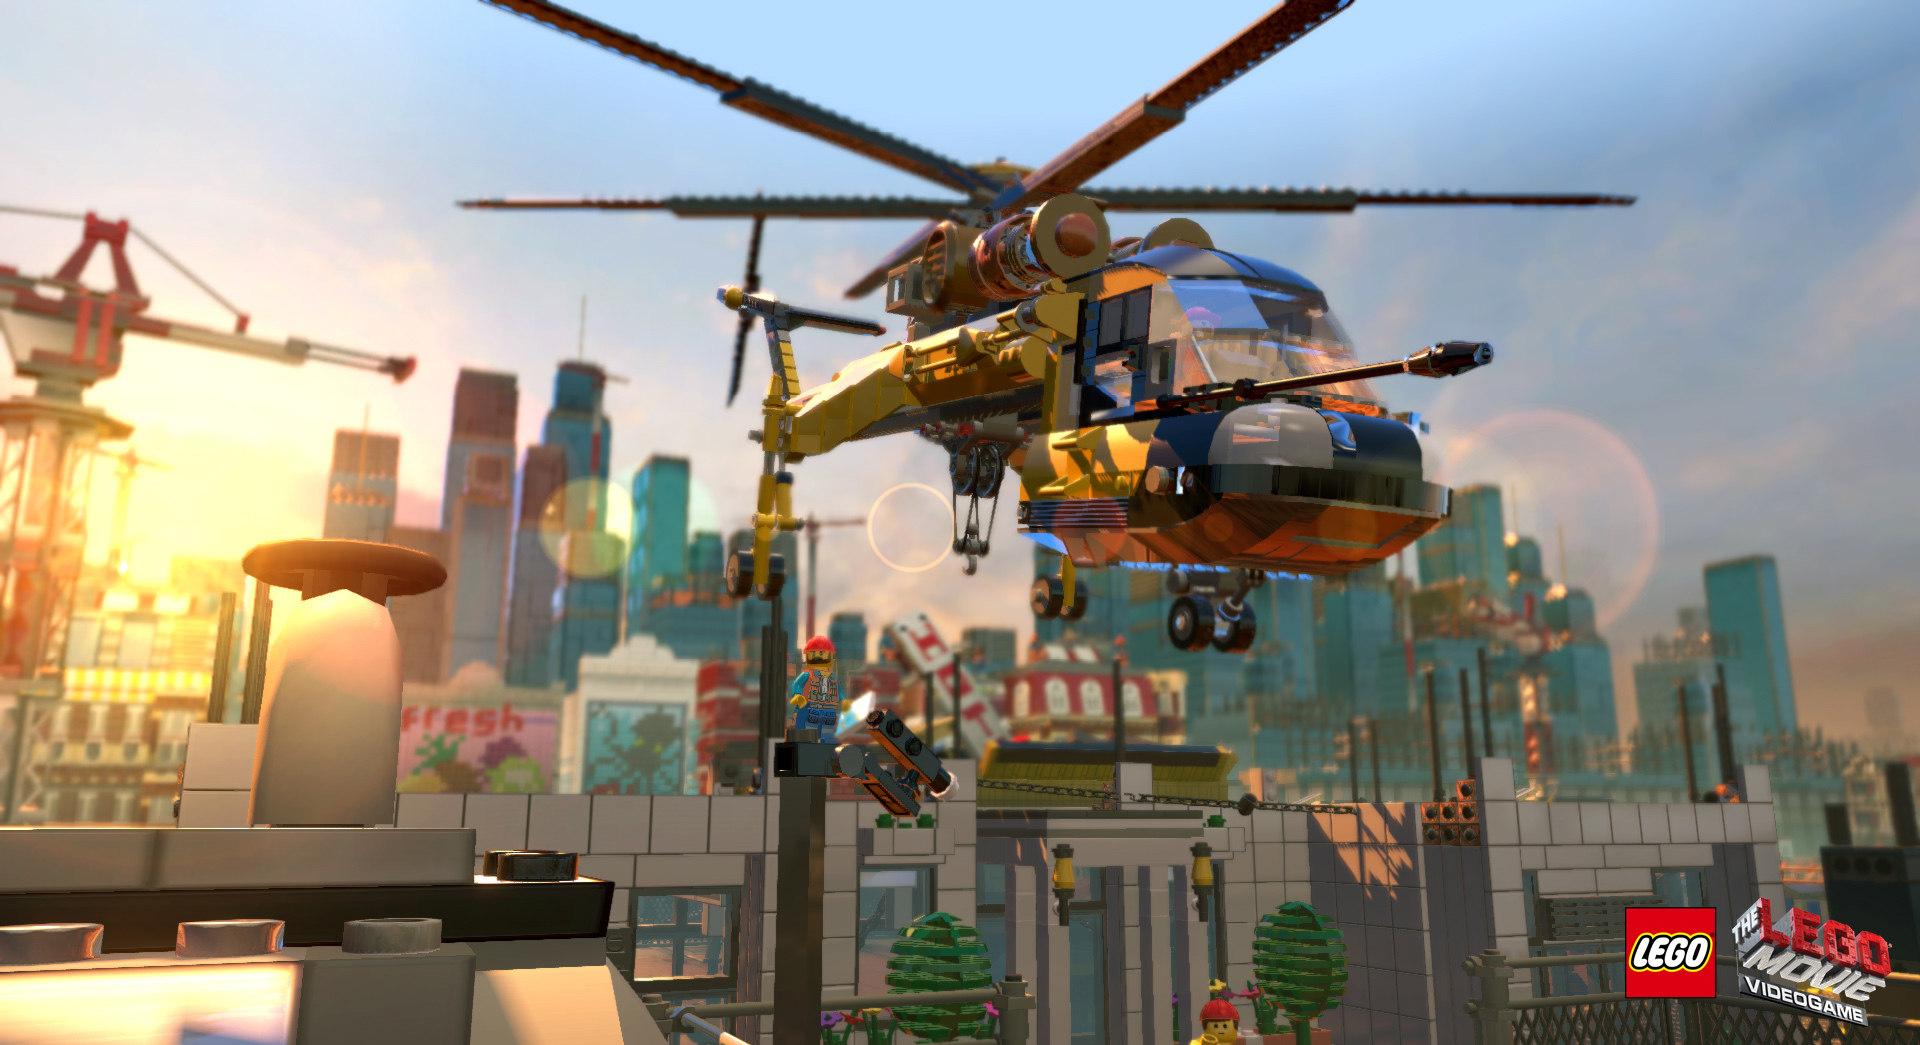 The LEGO Movie Videogame LegoVideoGame_30675_screen